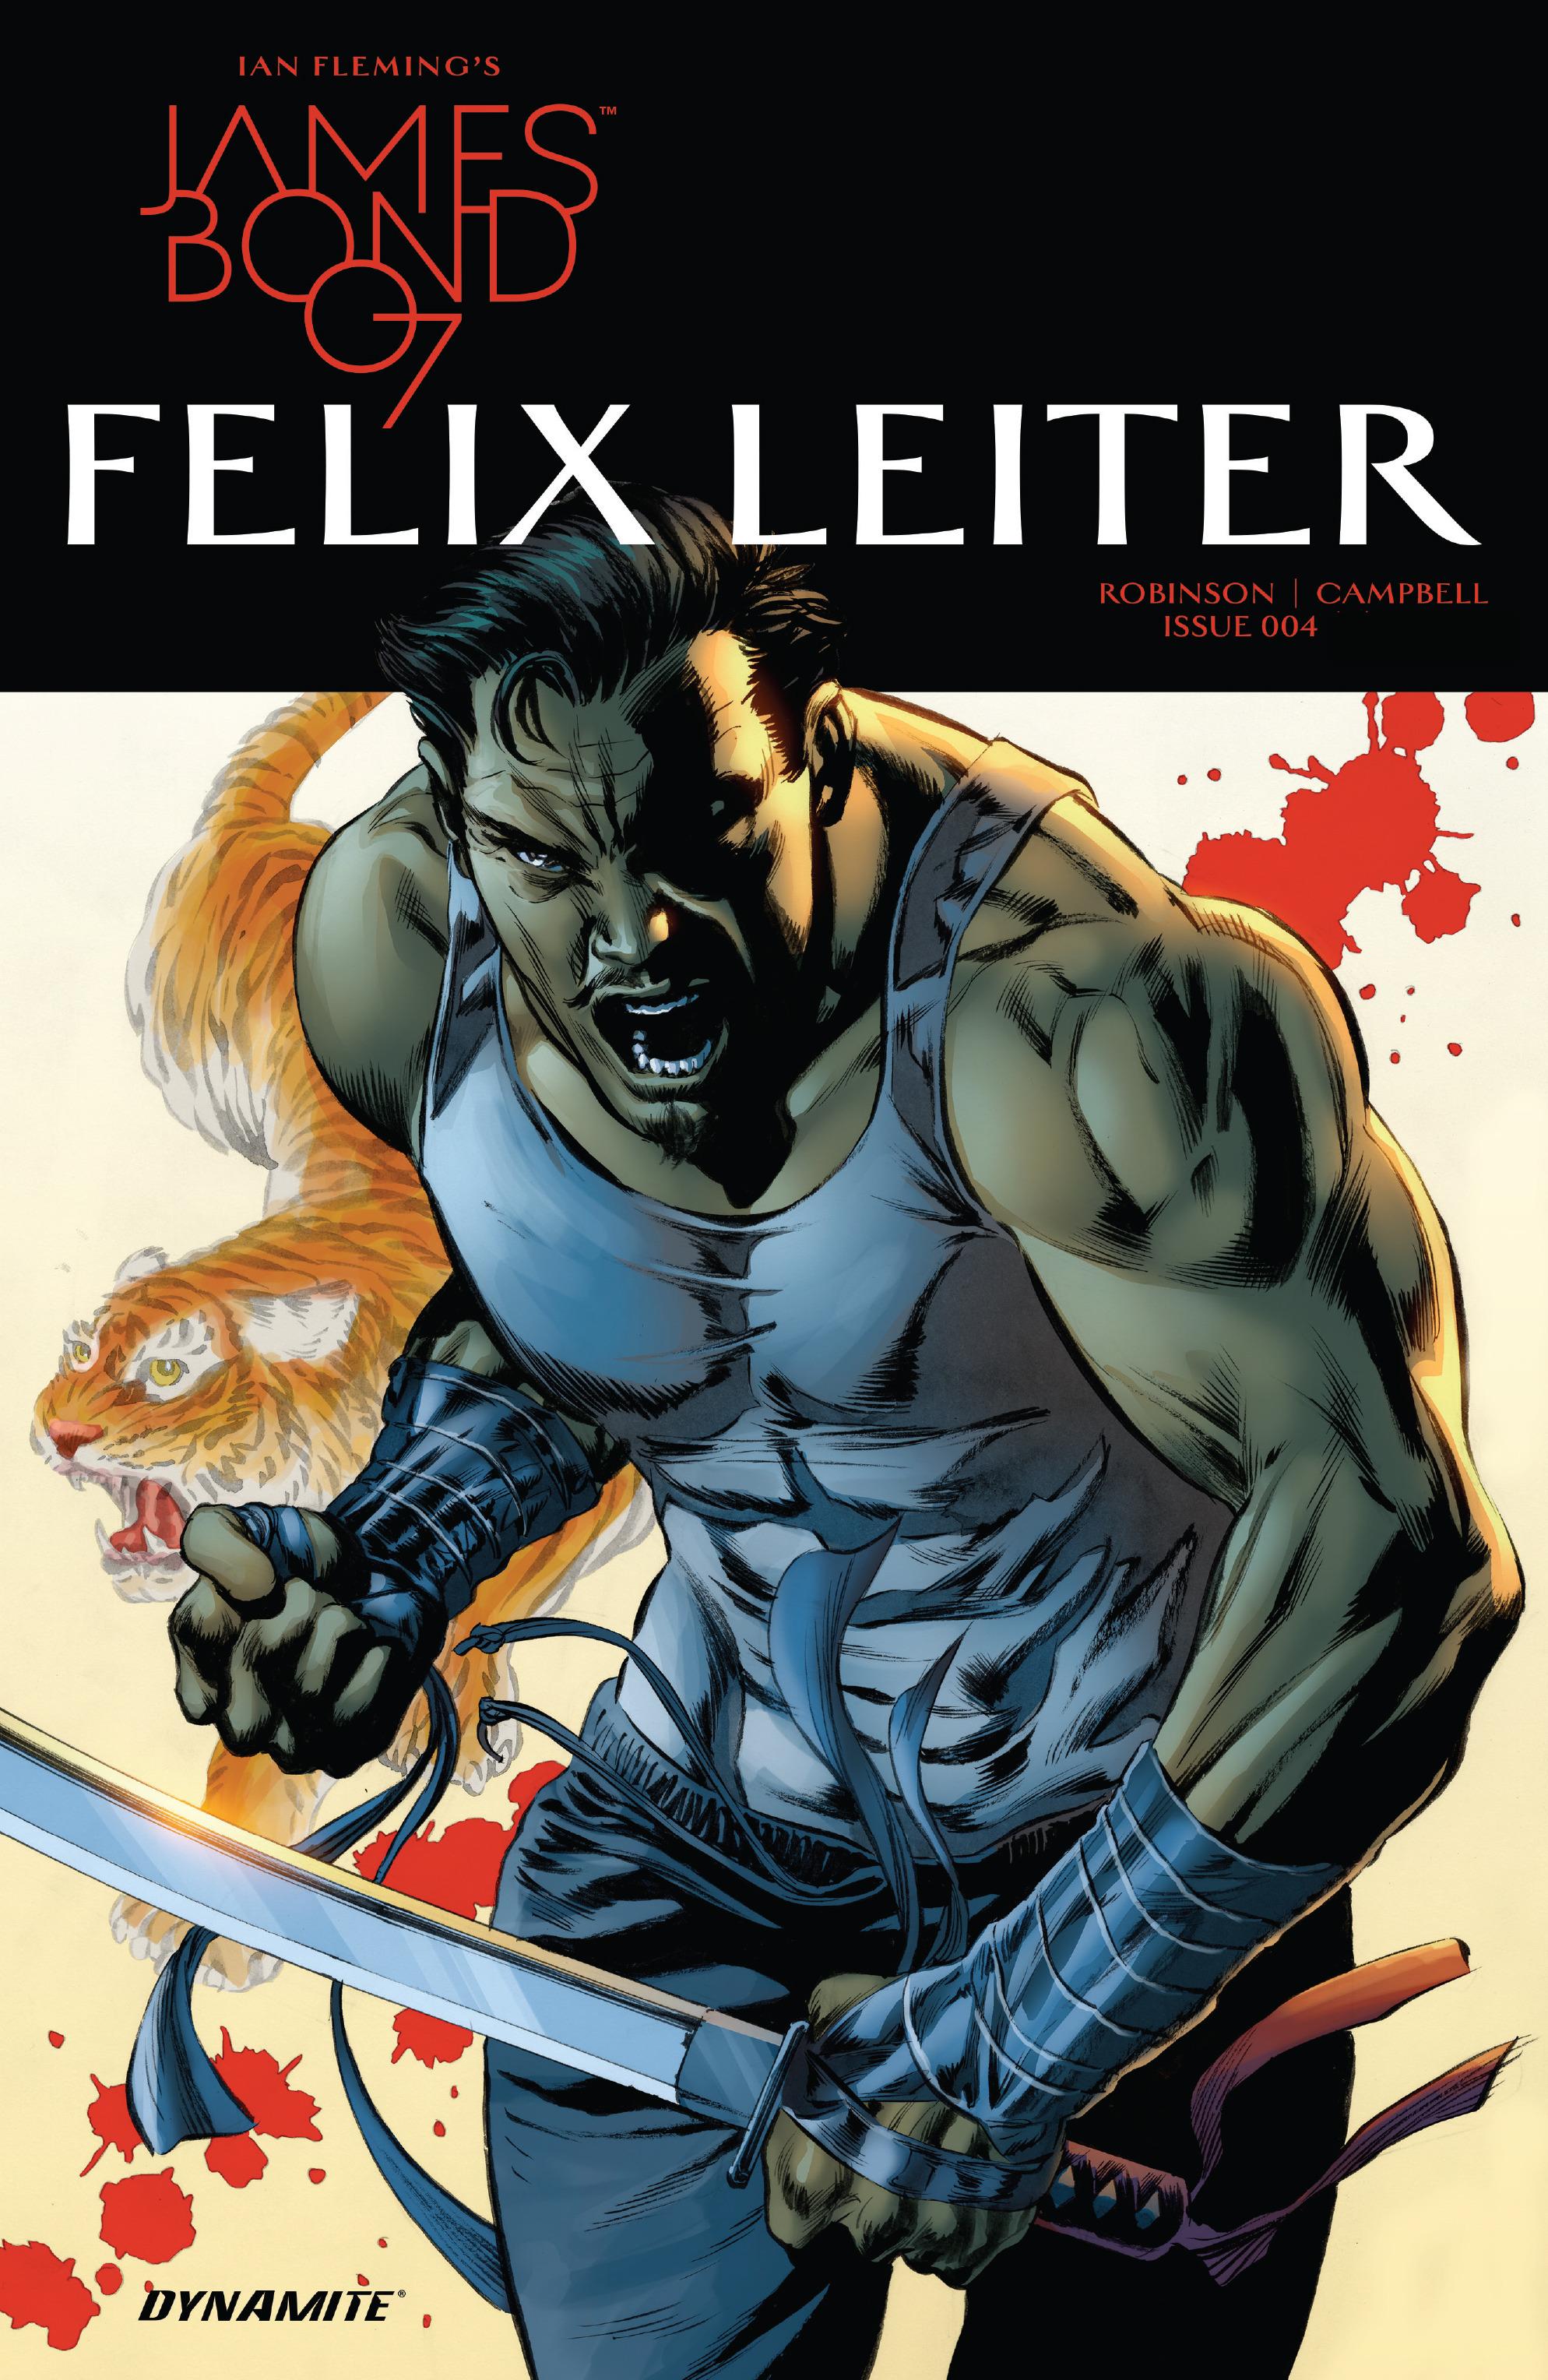 Read online James Bond: Felix Leiter comic -  Issue #4 - 1